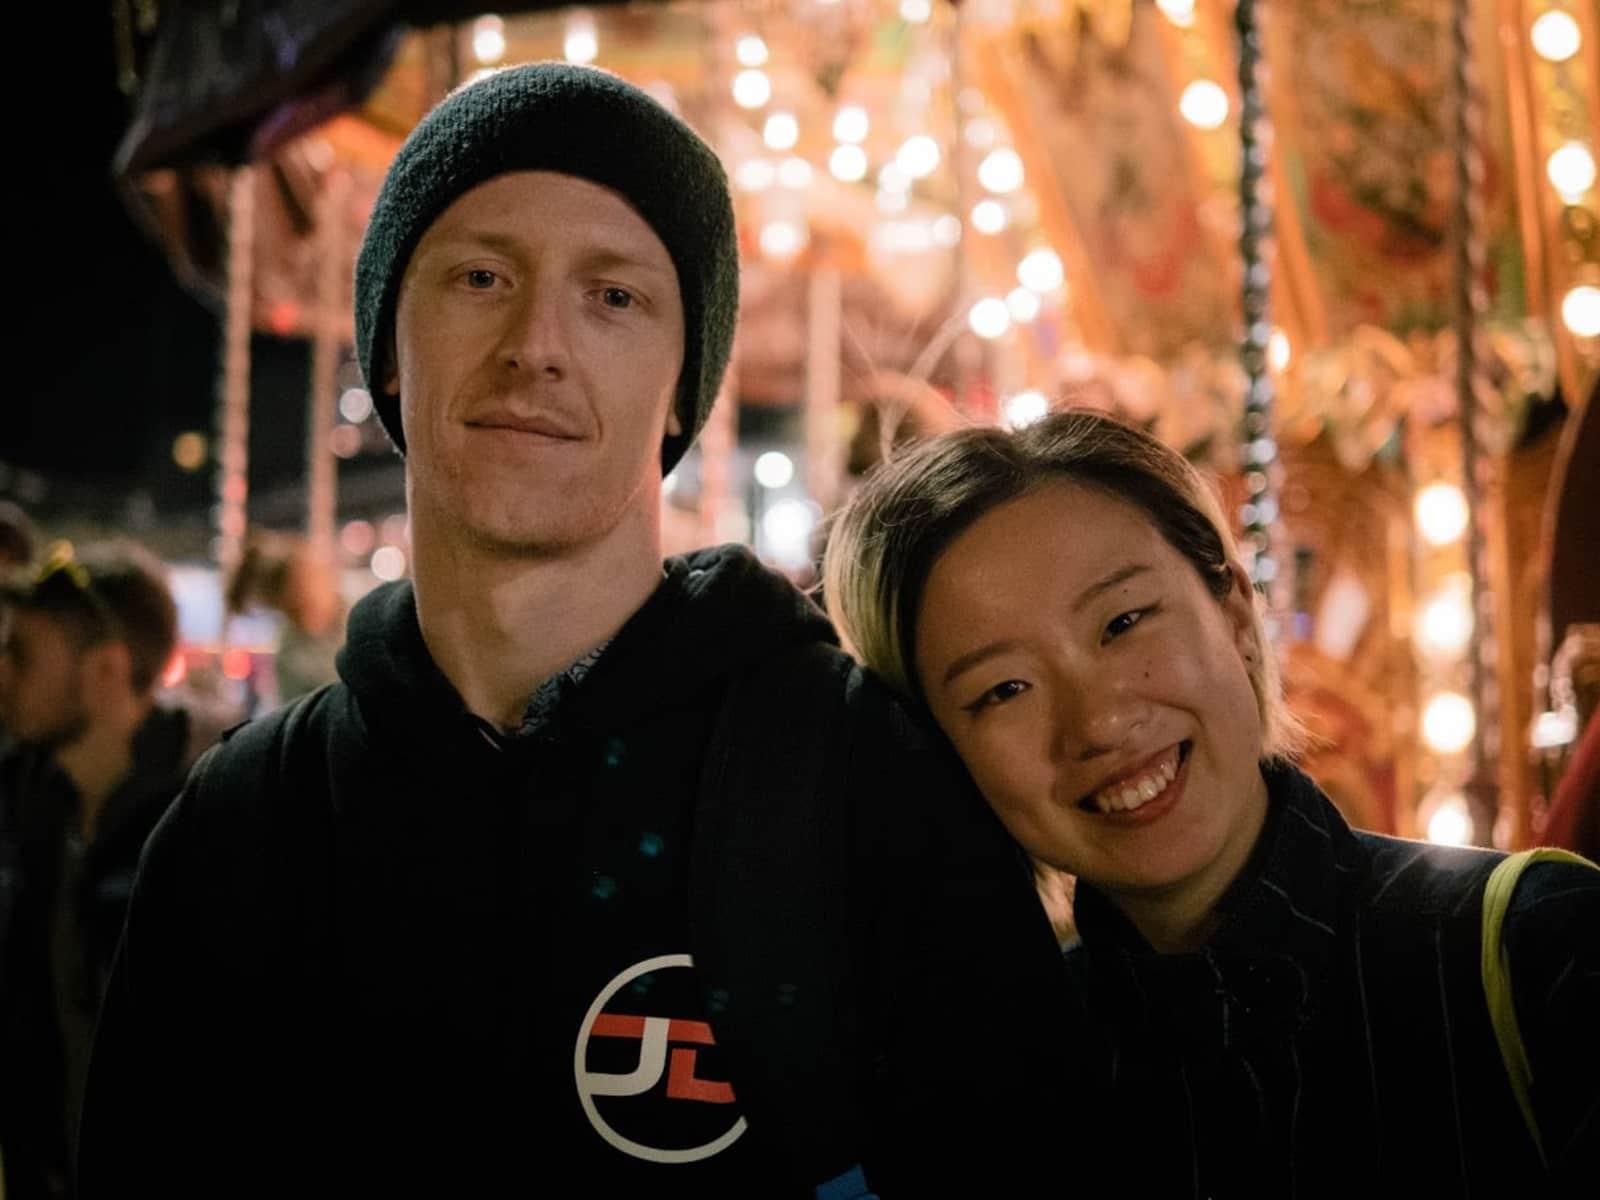 Soyun & Jae from The Hague, Netherlands